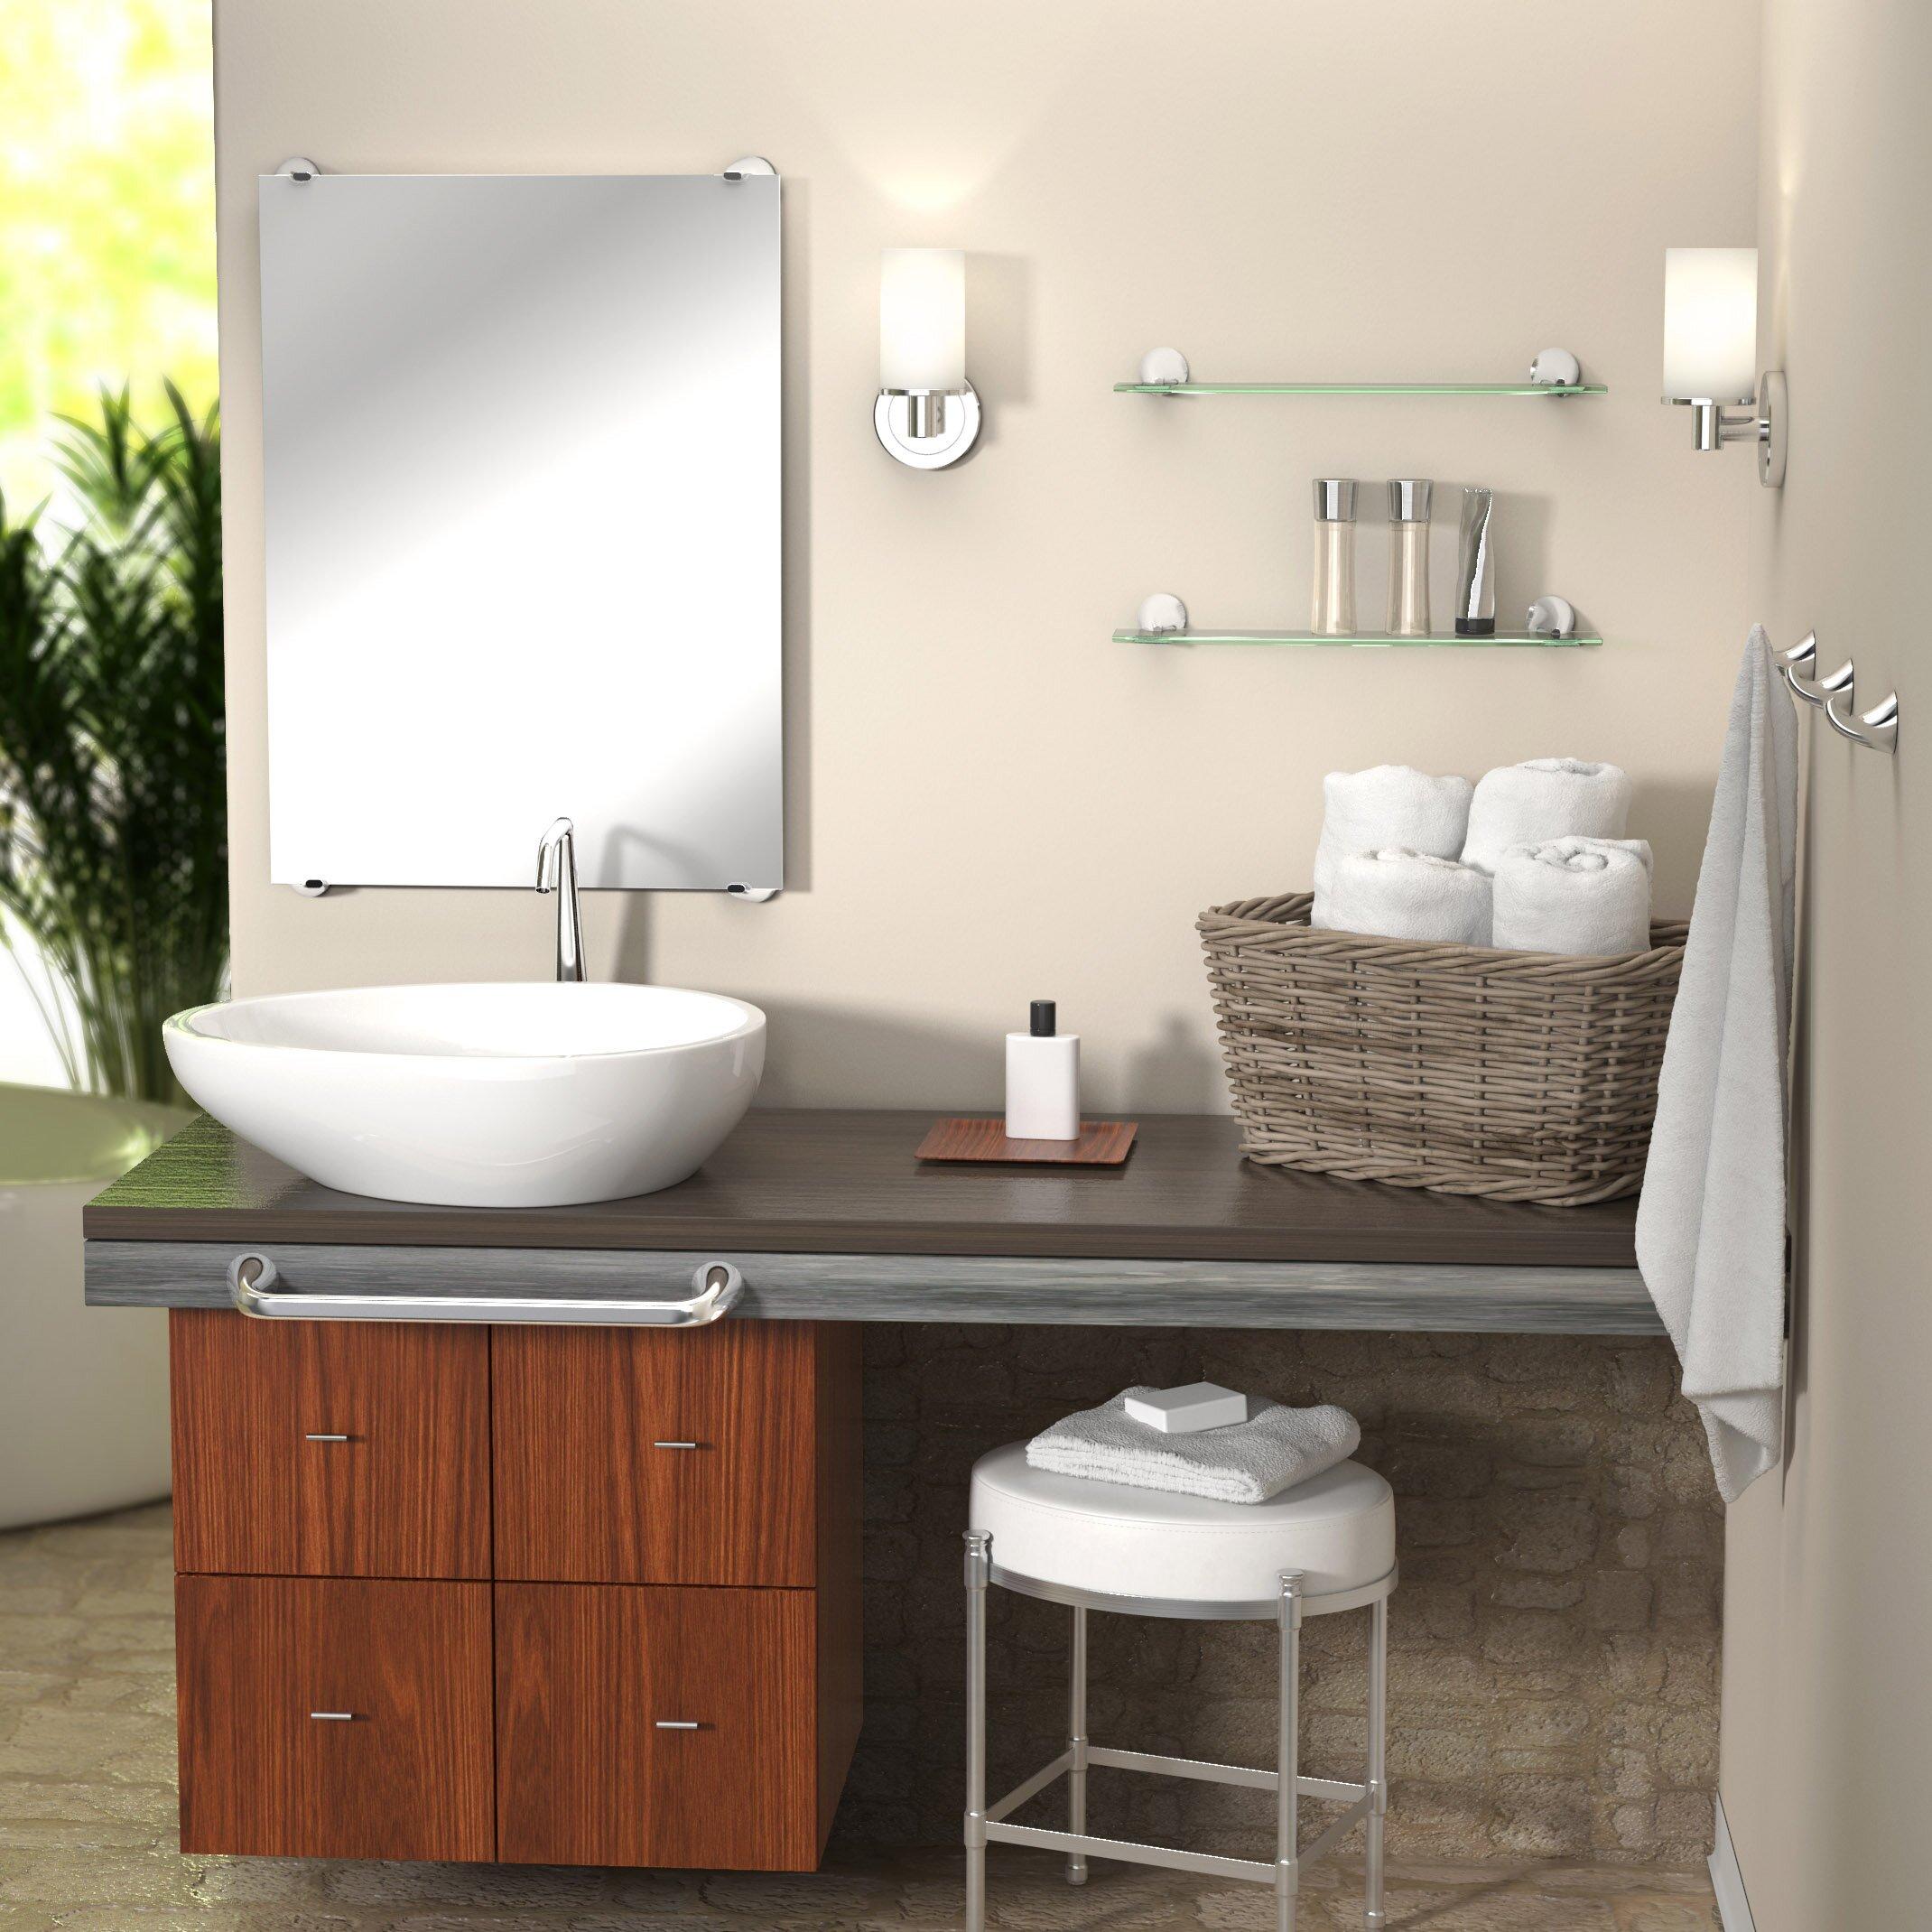 Gatco Brie Minimalist Wall Mirror Bathroom Vanity Mirror Reviews